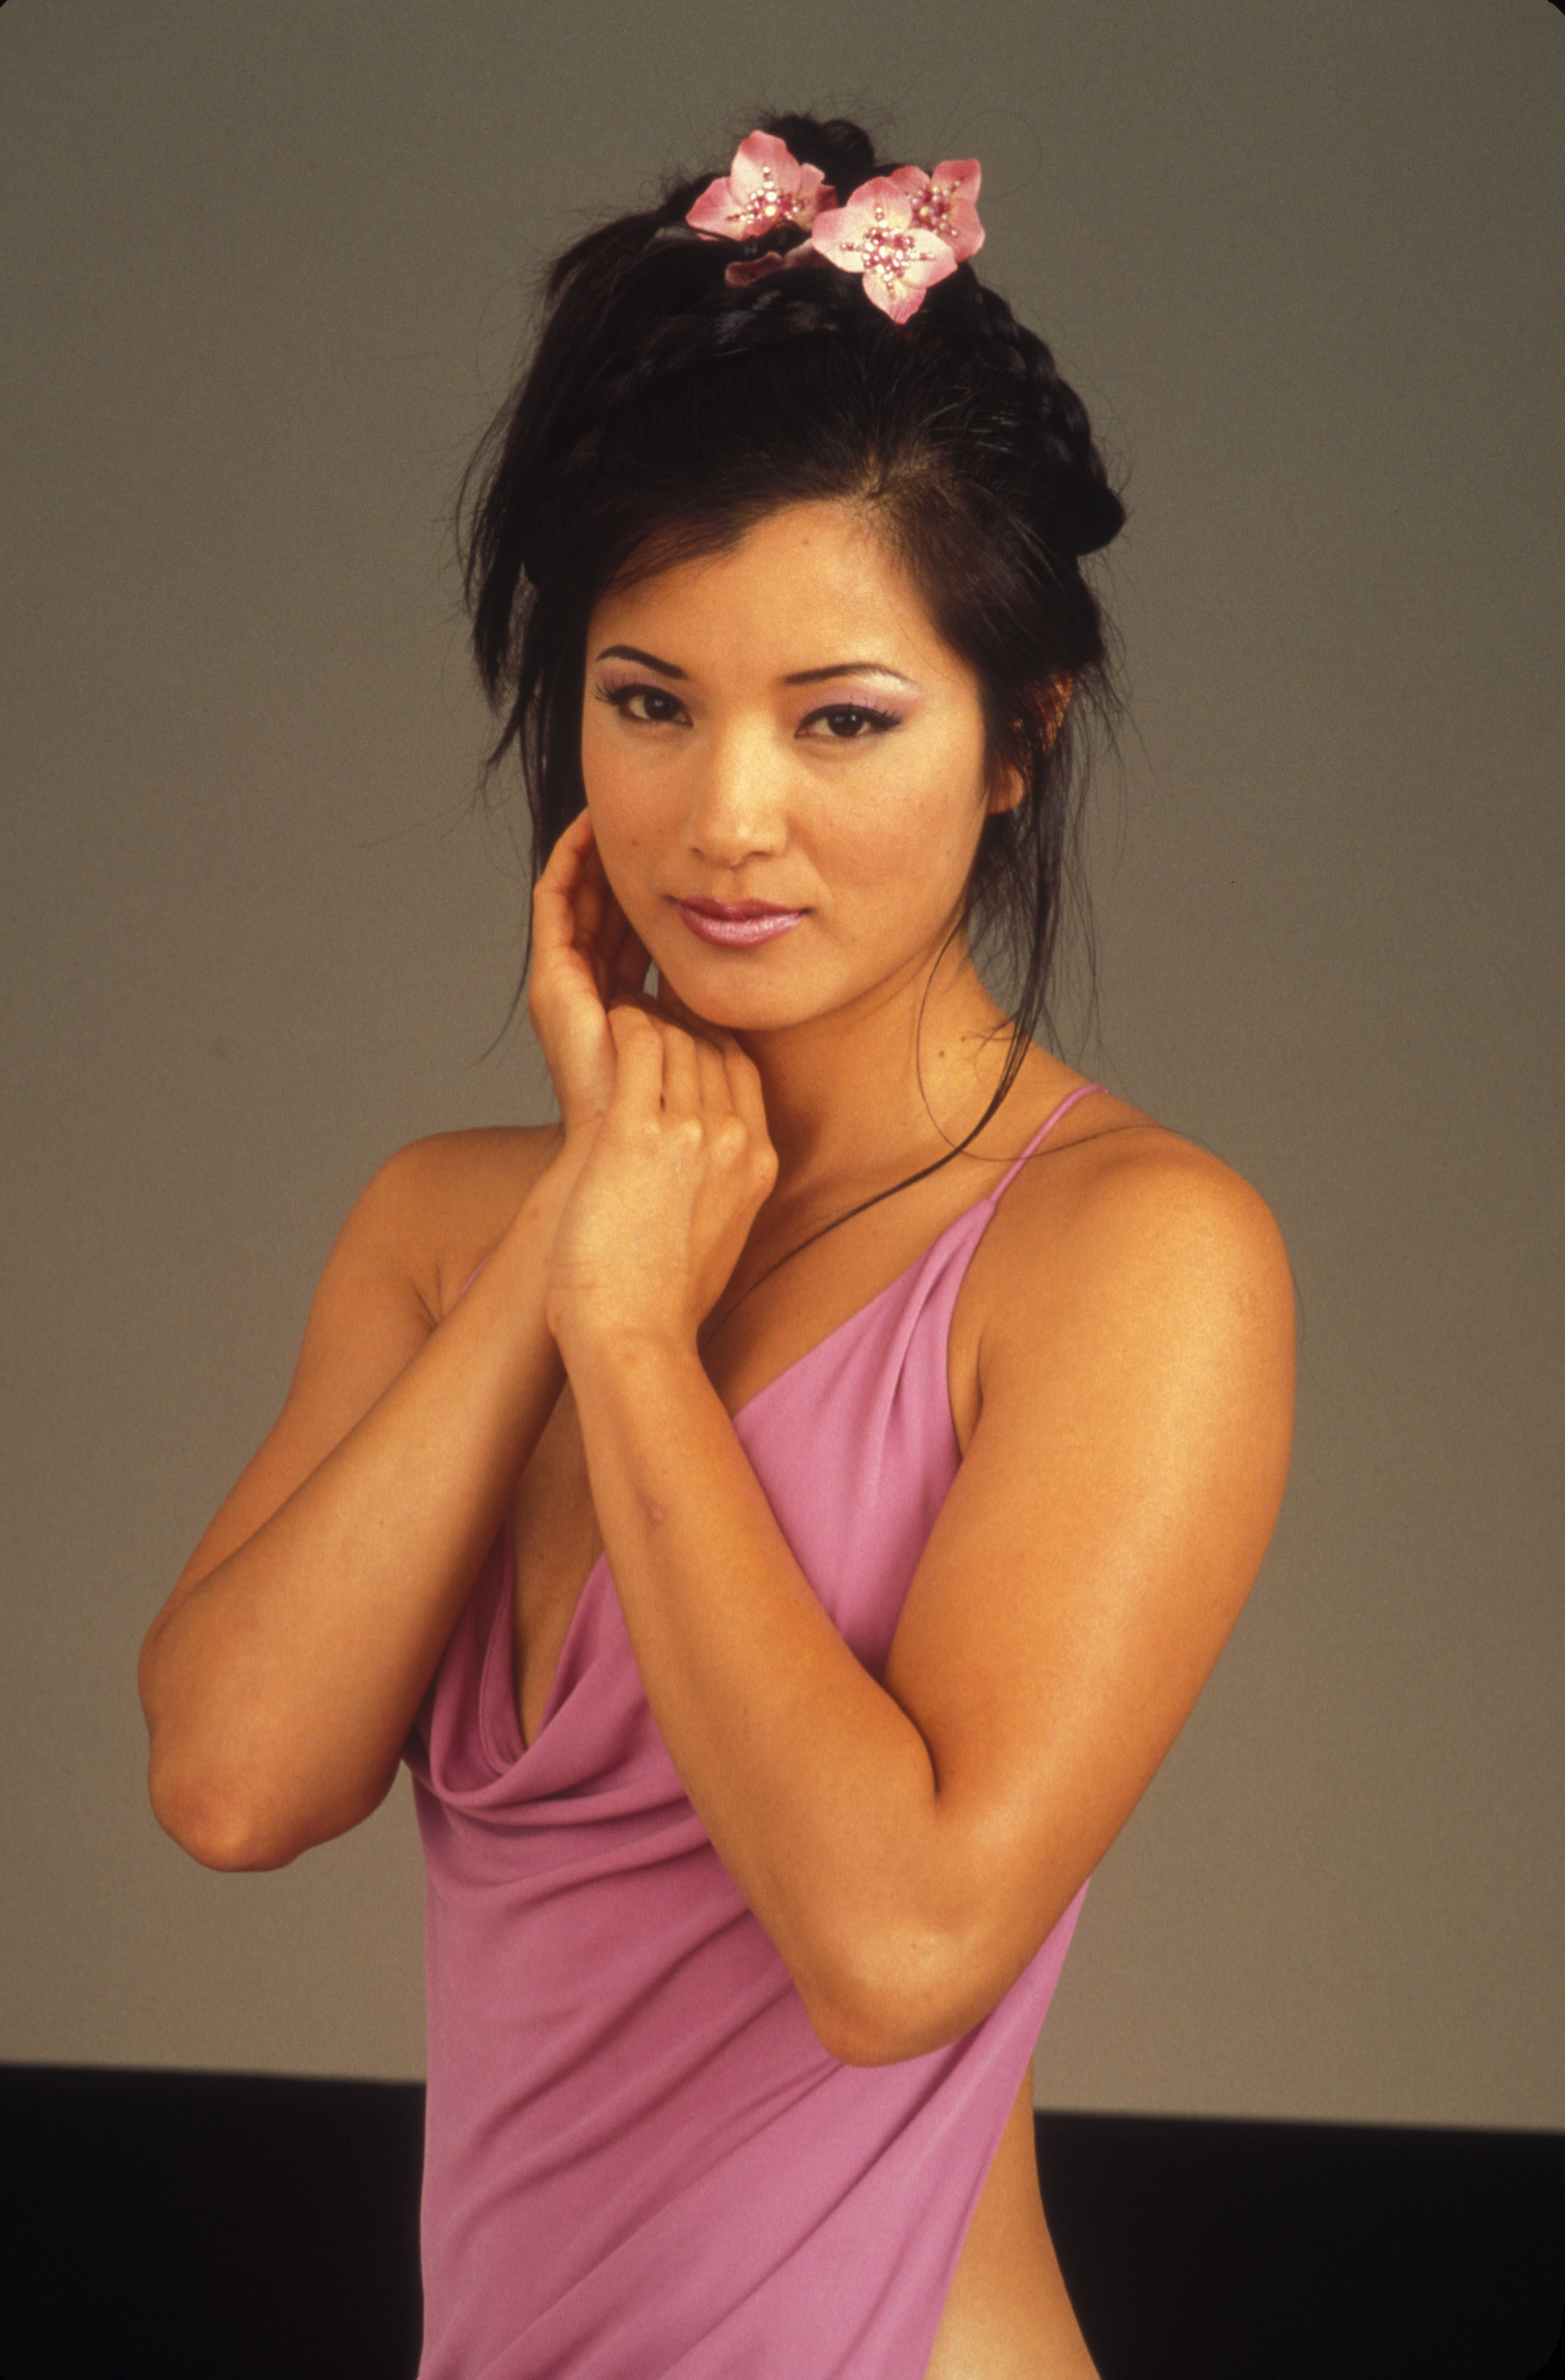 Kelly Hu photo 77 of 85 pics, wallpaper - photo #359759 ... Cameron Diaz Twitter